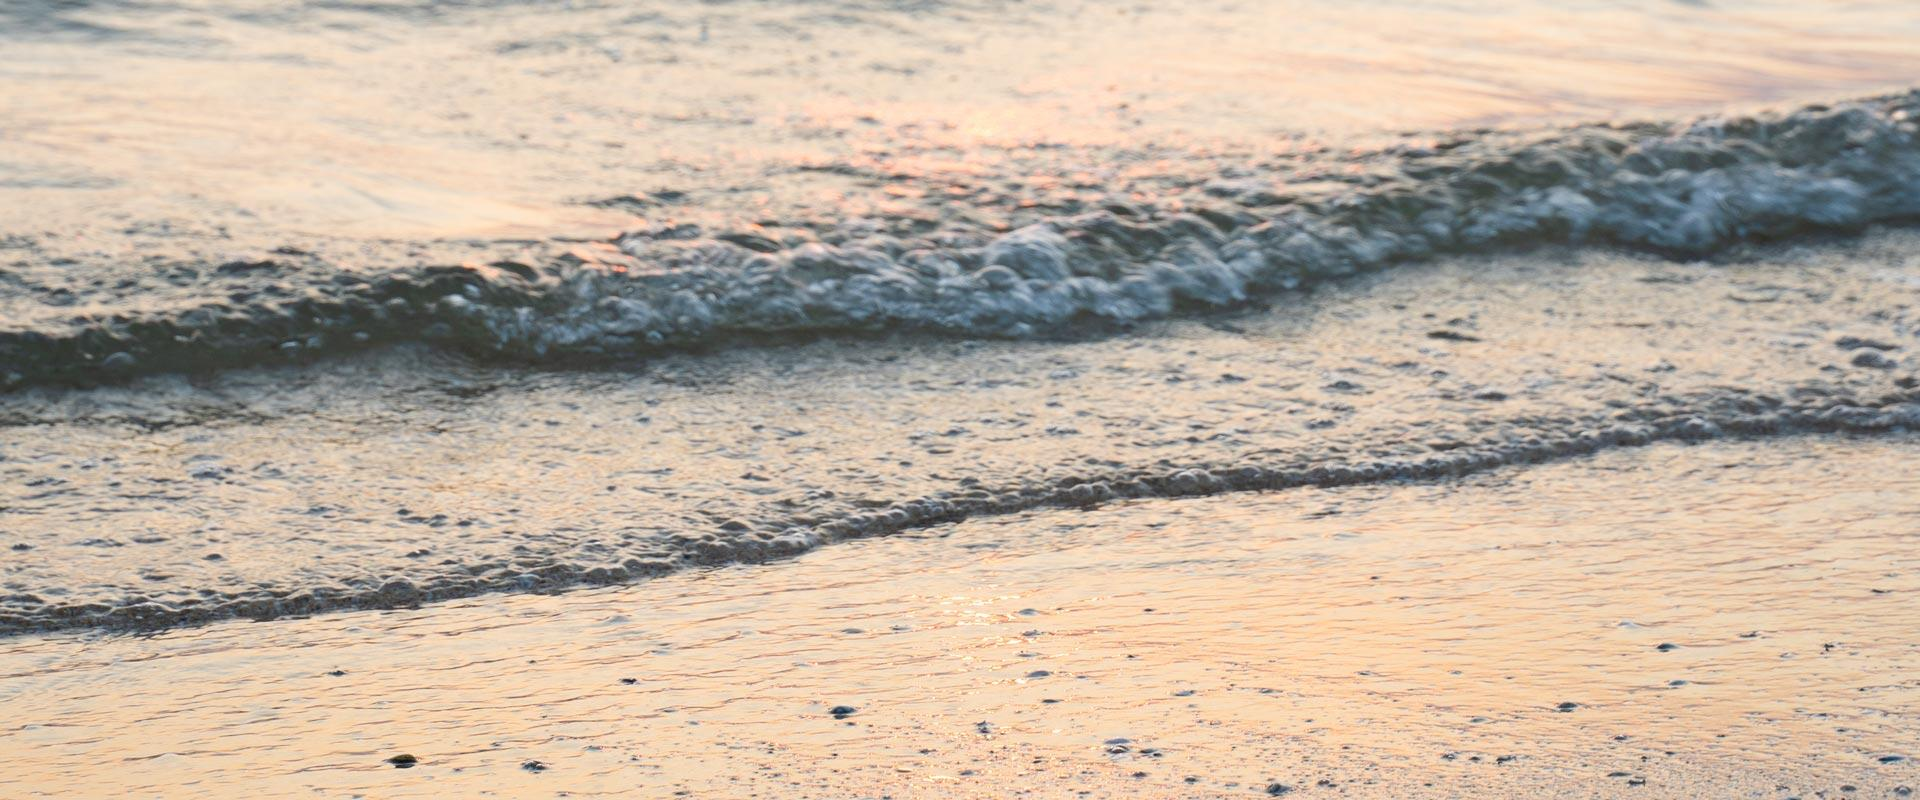 rivierahotelsenigallia it spiaggia 001